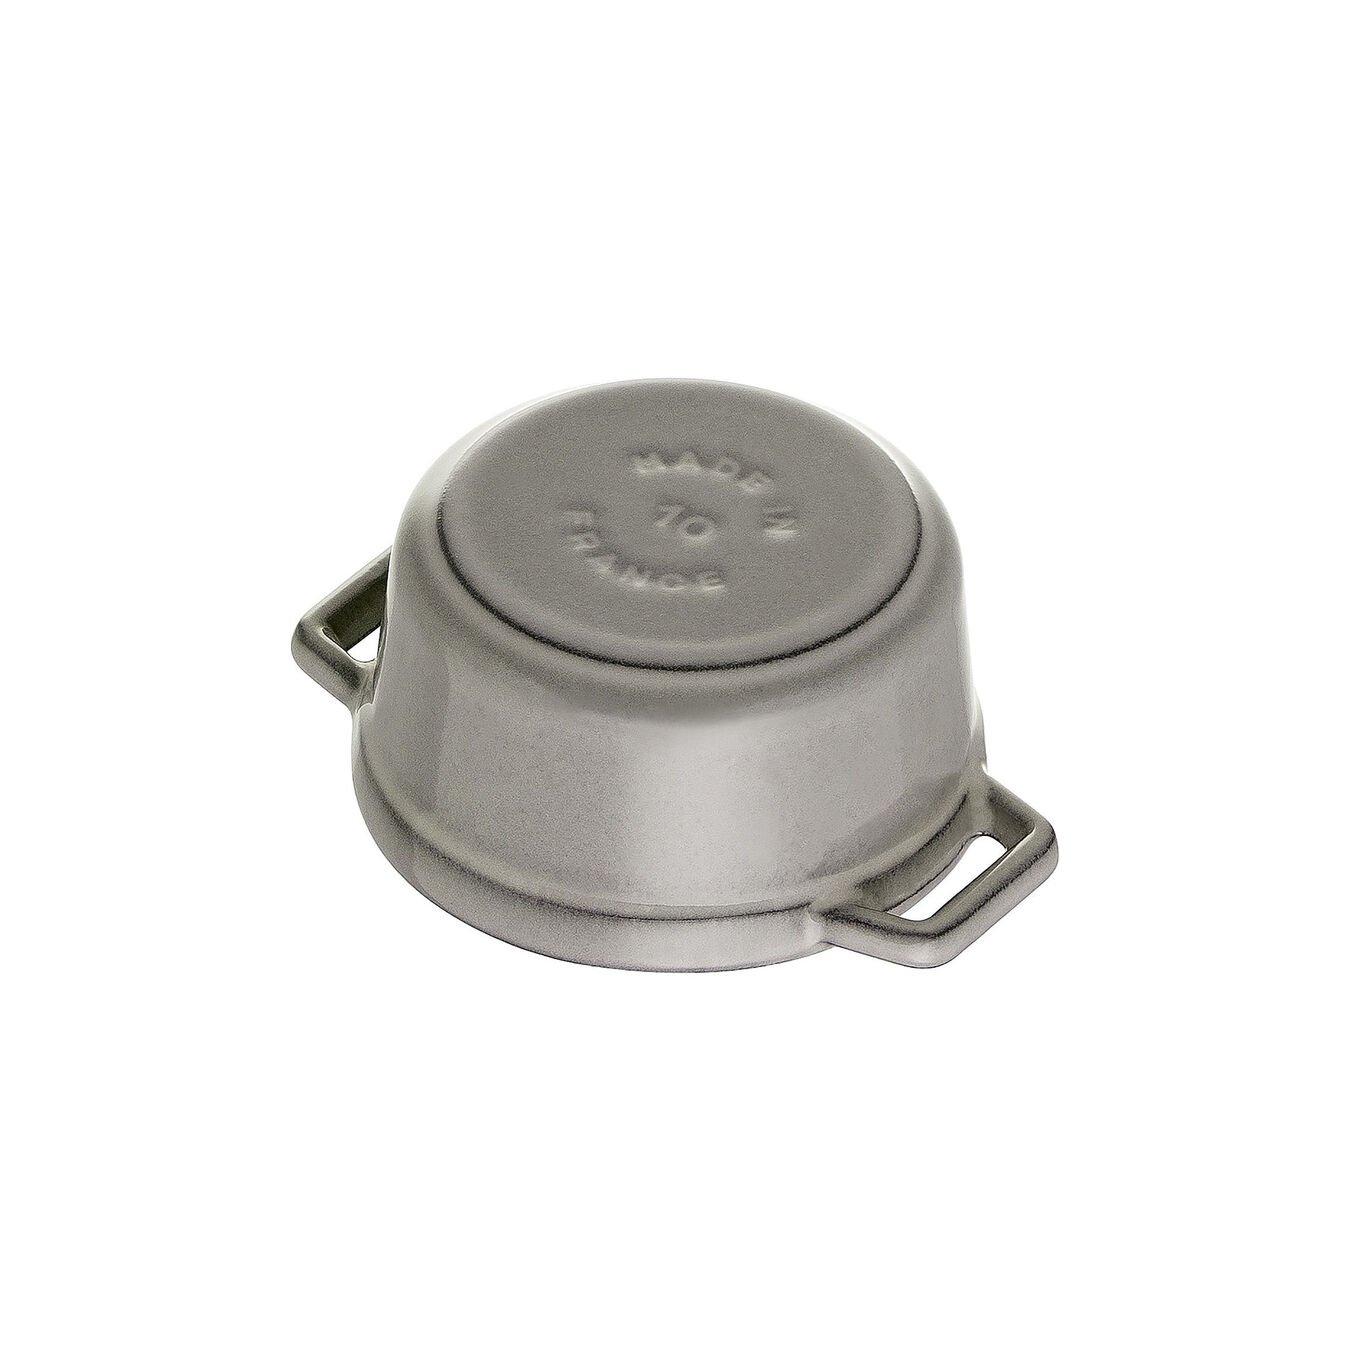 250 ml round Mini Cocotte, graphite-grey,,large 4